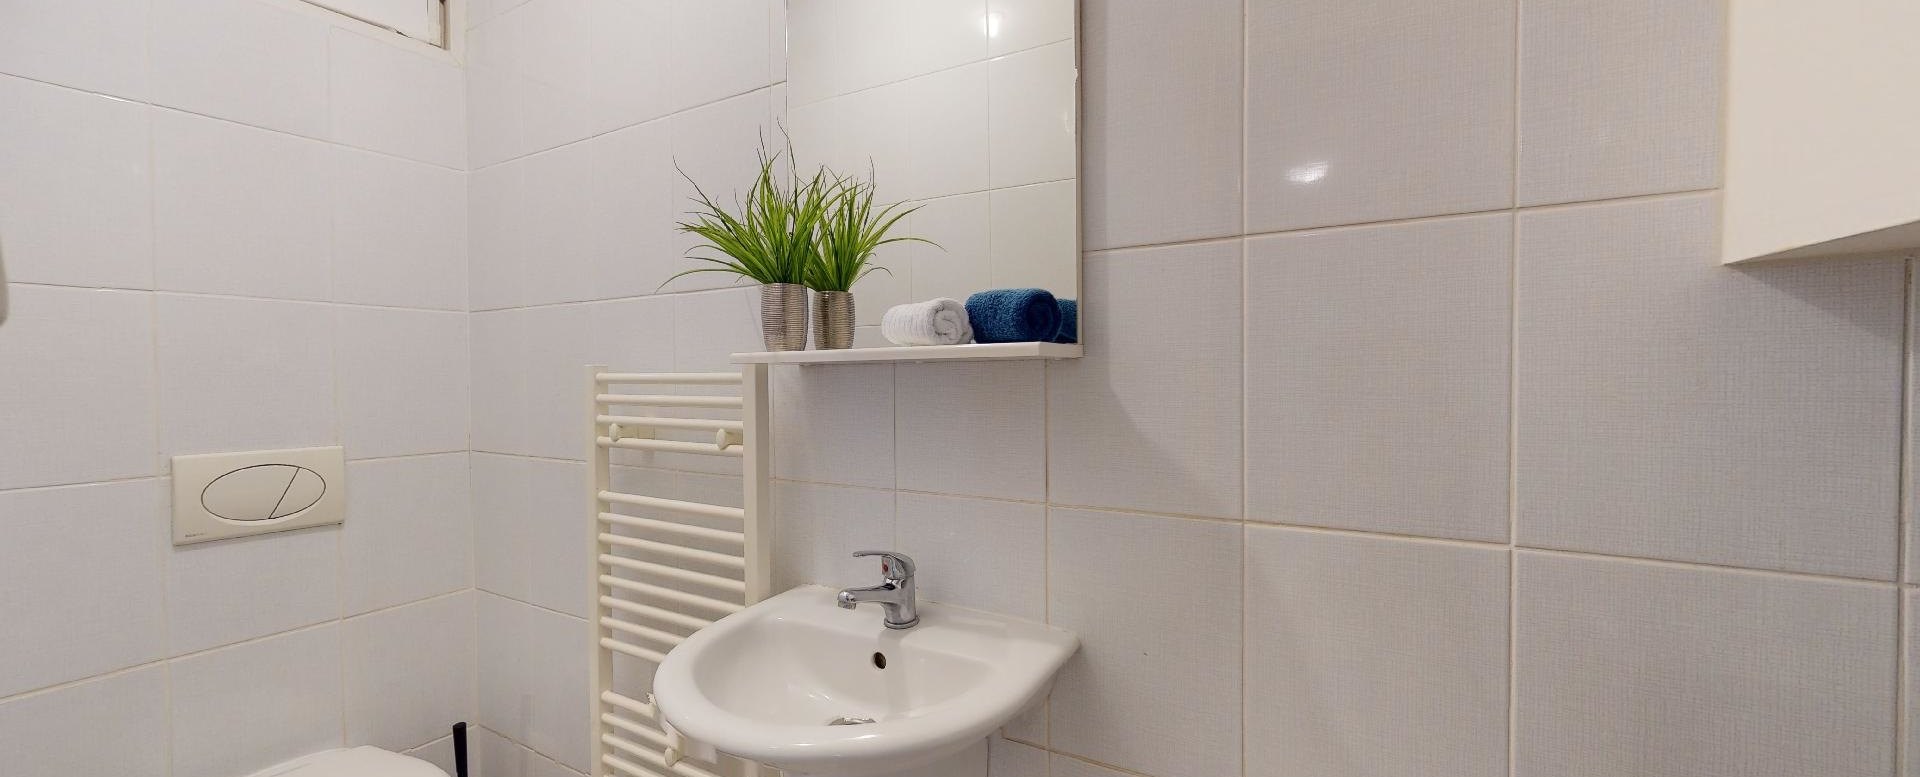 Toaleta 2-izbového bytu v Manderláku